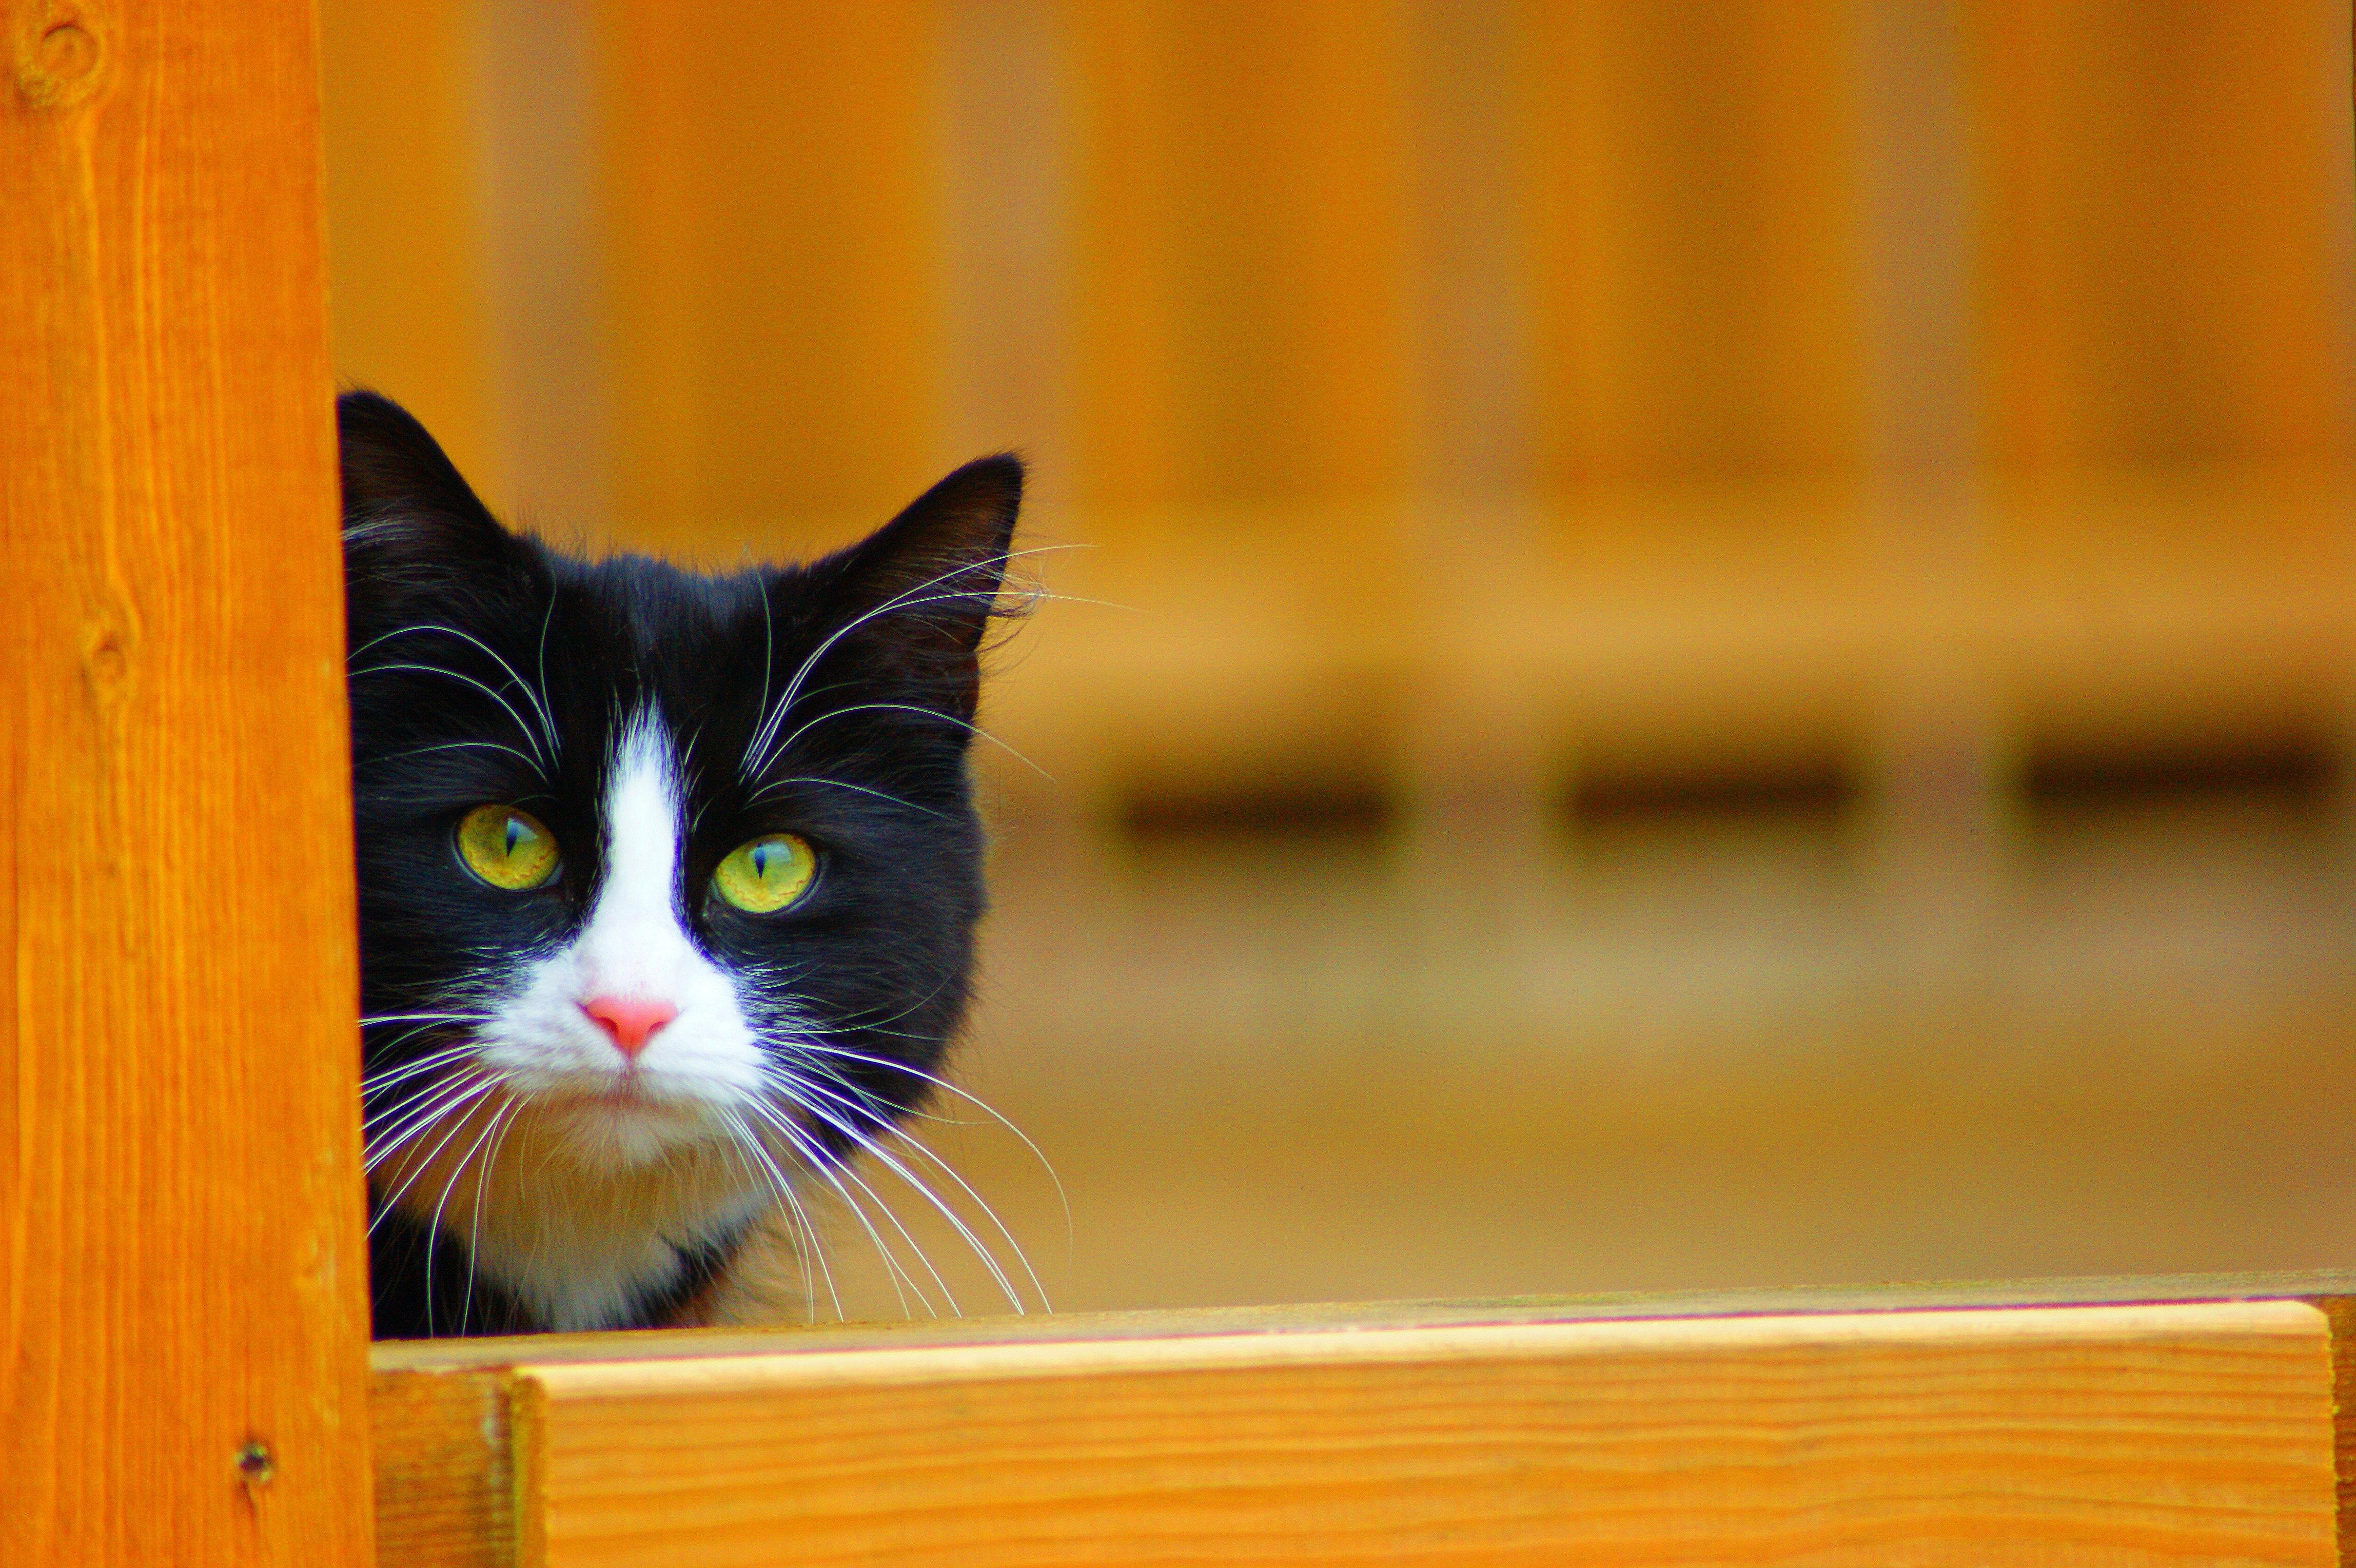 Kostenloses Foto Zum Thema Norwegische Waldkatze